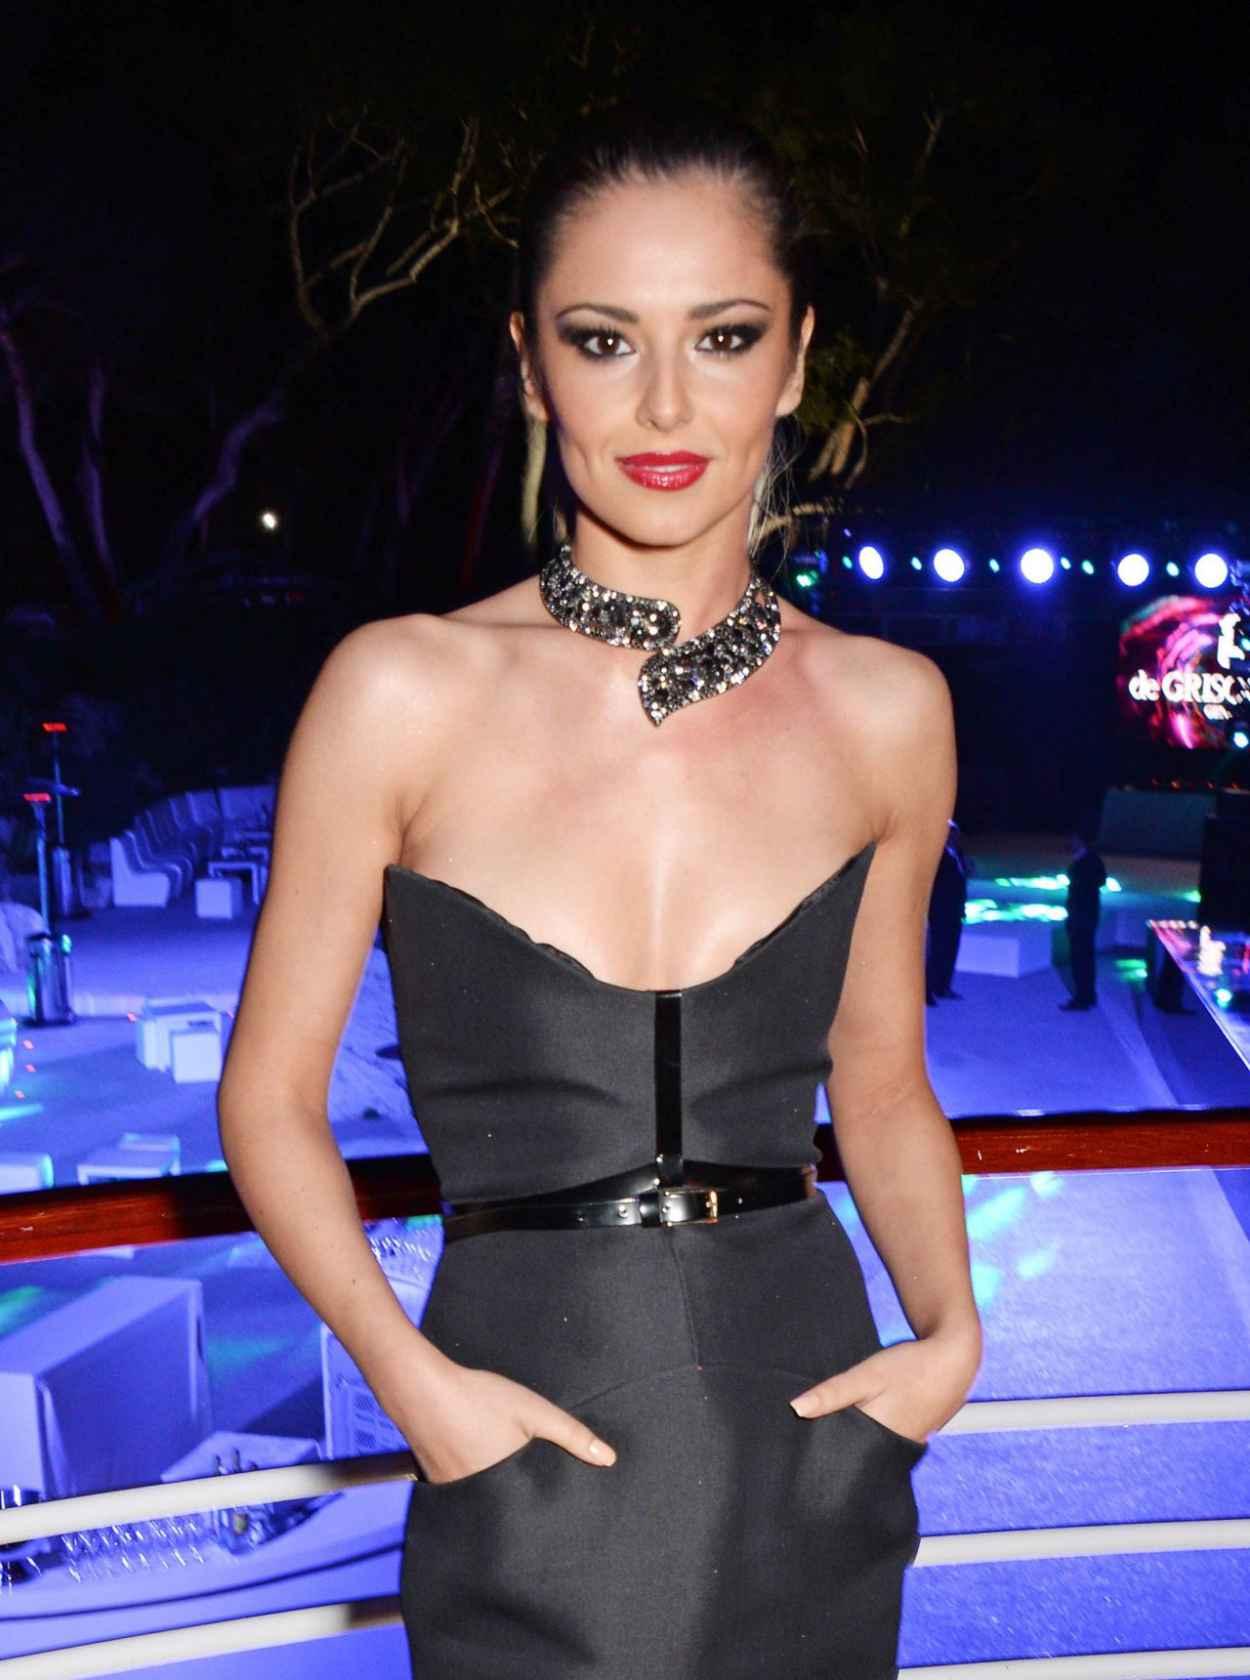 Cheryl Cole at de Grisogono Fatale In Cannes Party - 2015 Cannes Film Festival-1